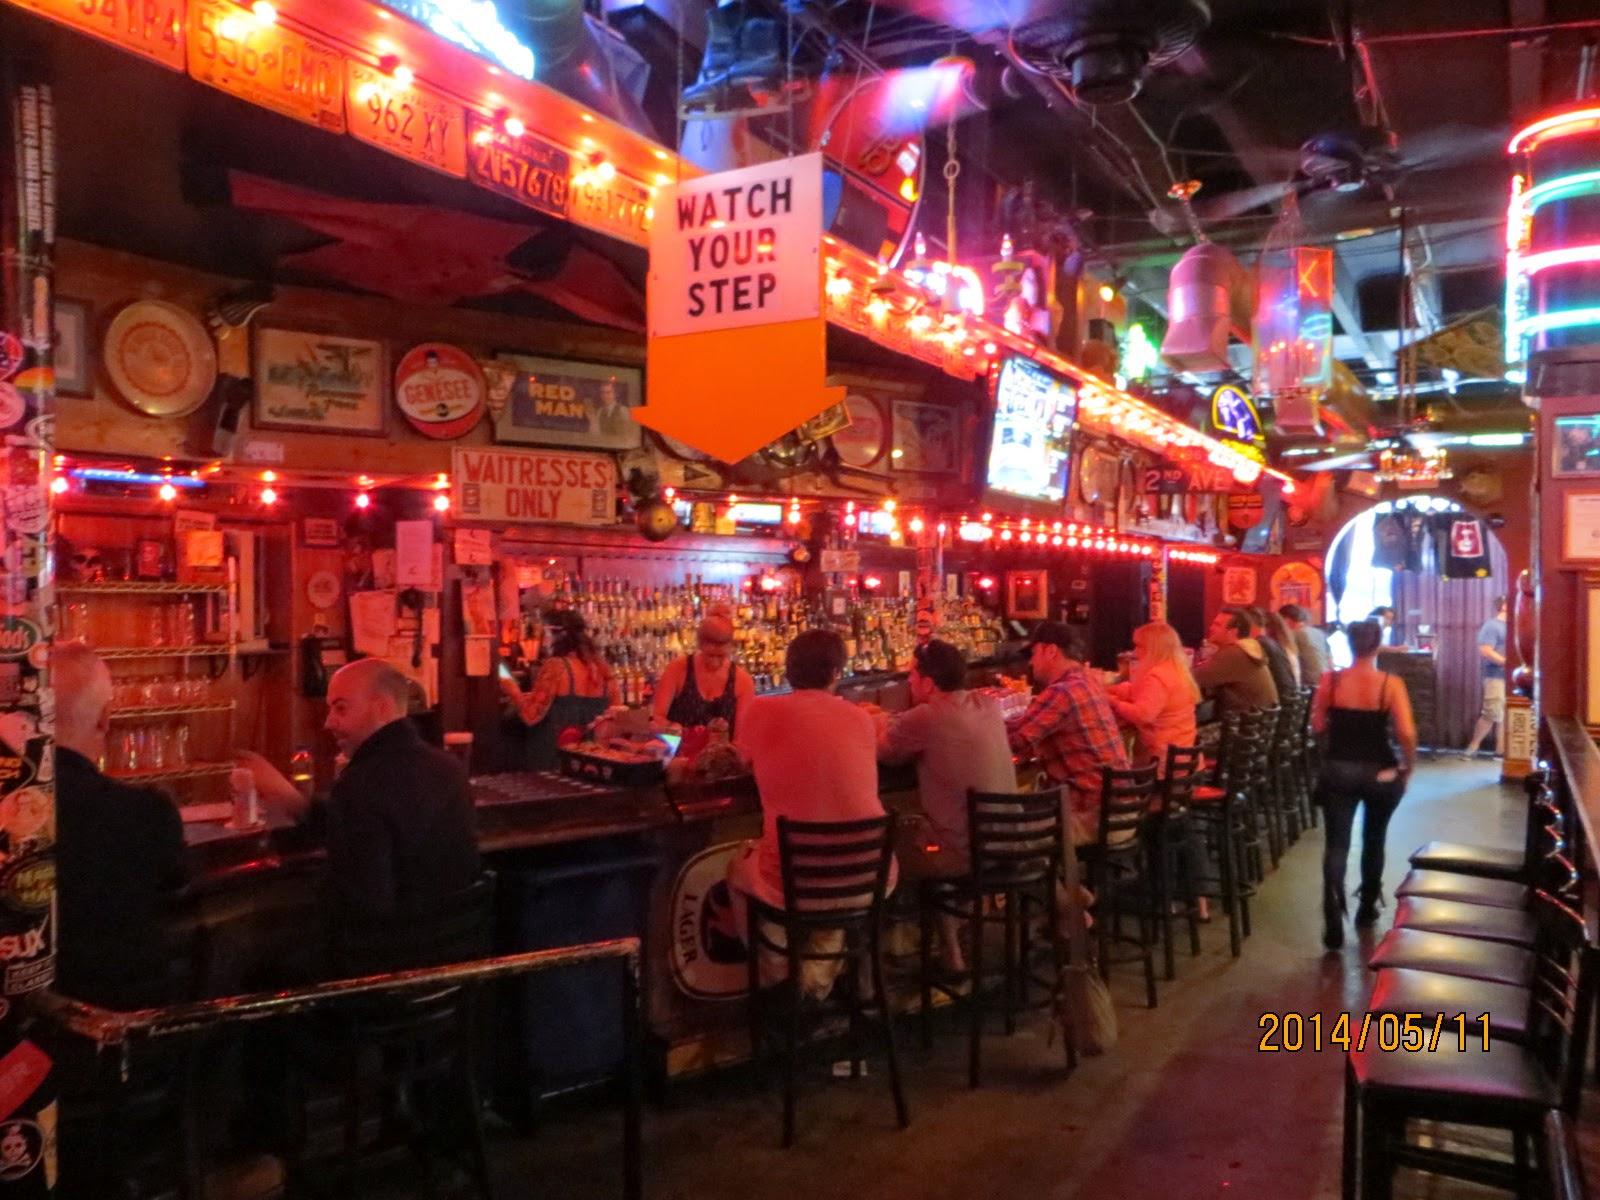 Jeeps Pubs Taverns and Bars: Vortex Bar and Grill (Atlanta ...